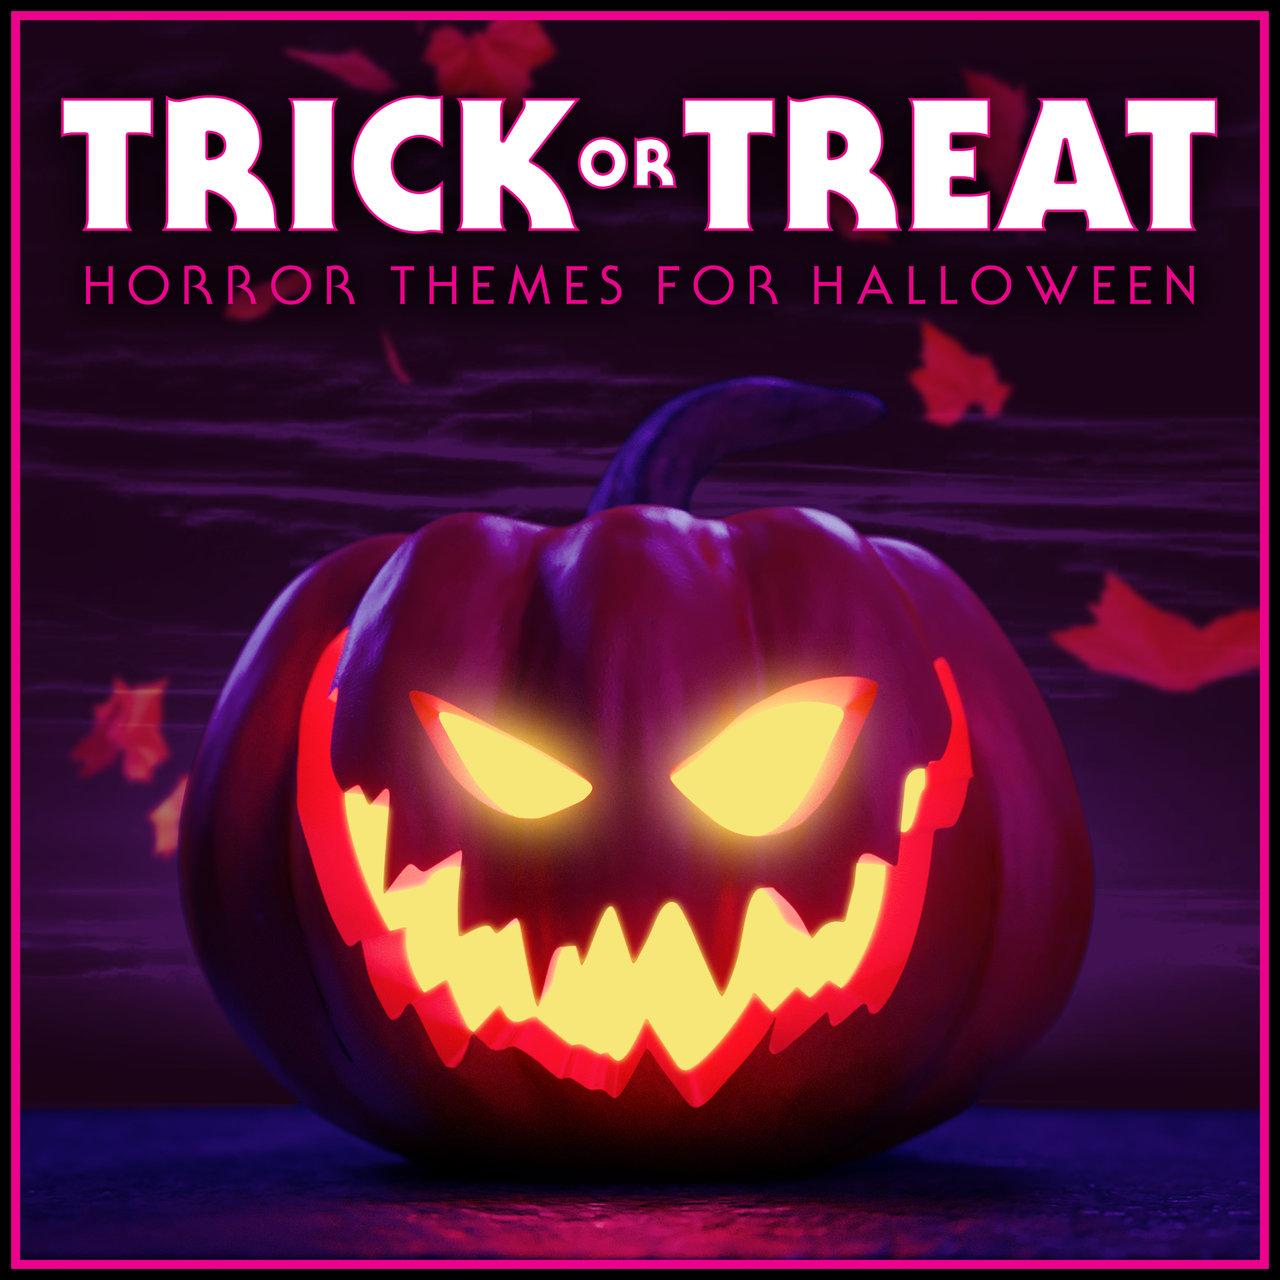 tidal: listen to t.v. thriller themes - the halloween soundtrack on